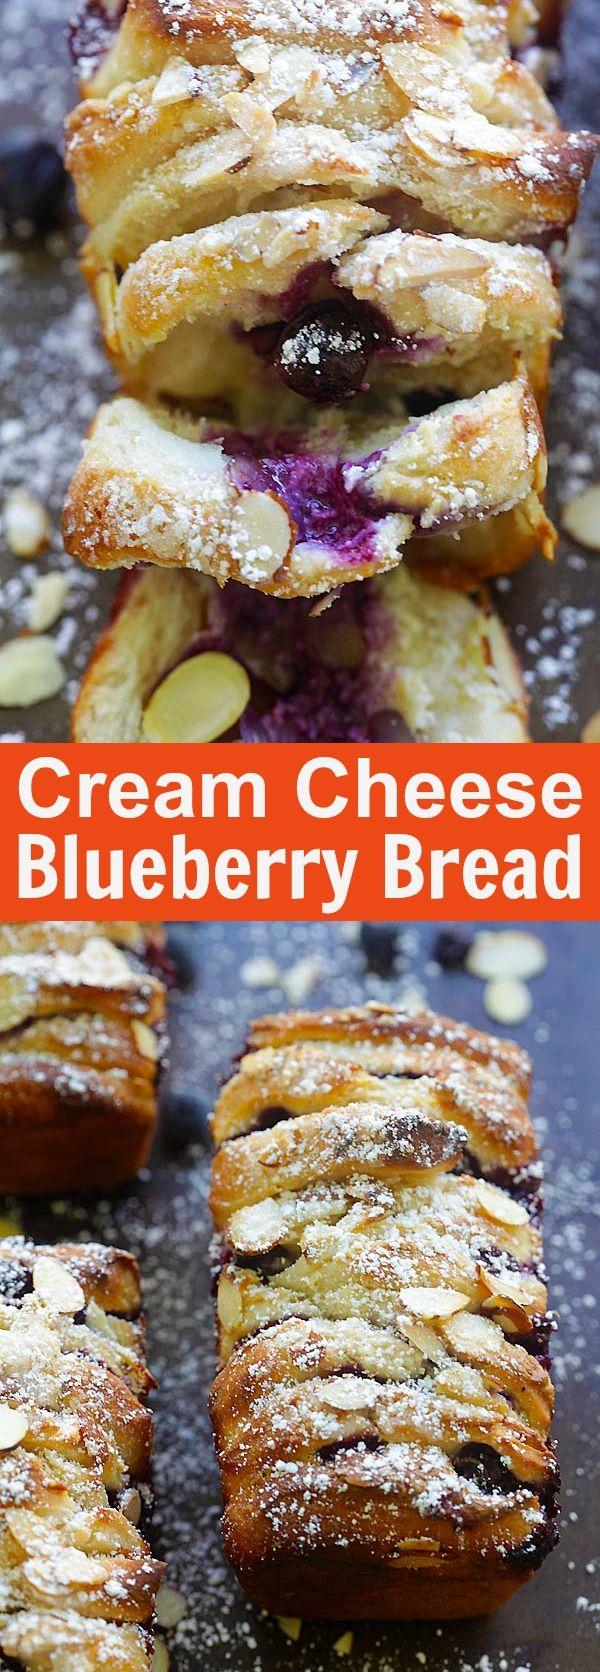 Blueberry-Cream Cheese Pull-Apart Bread – the best pull-apart bread loaded with cream cheese and blueberries. So delicious | rasamalaysia.com